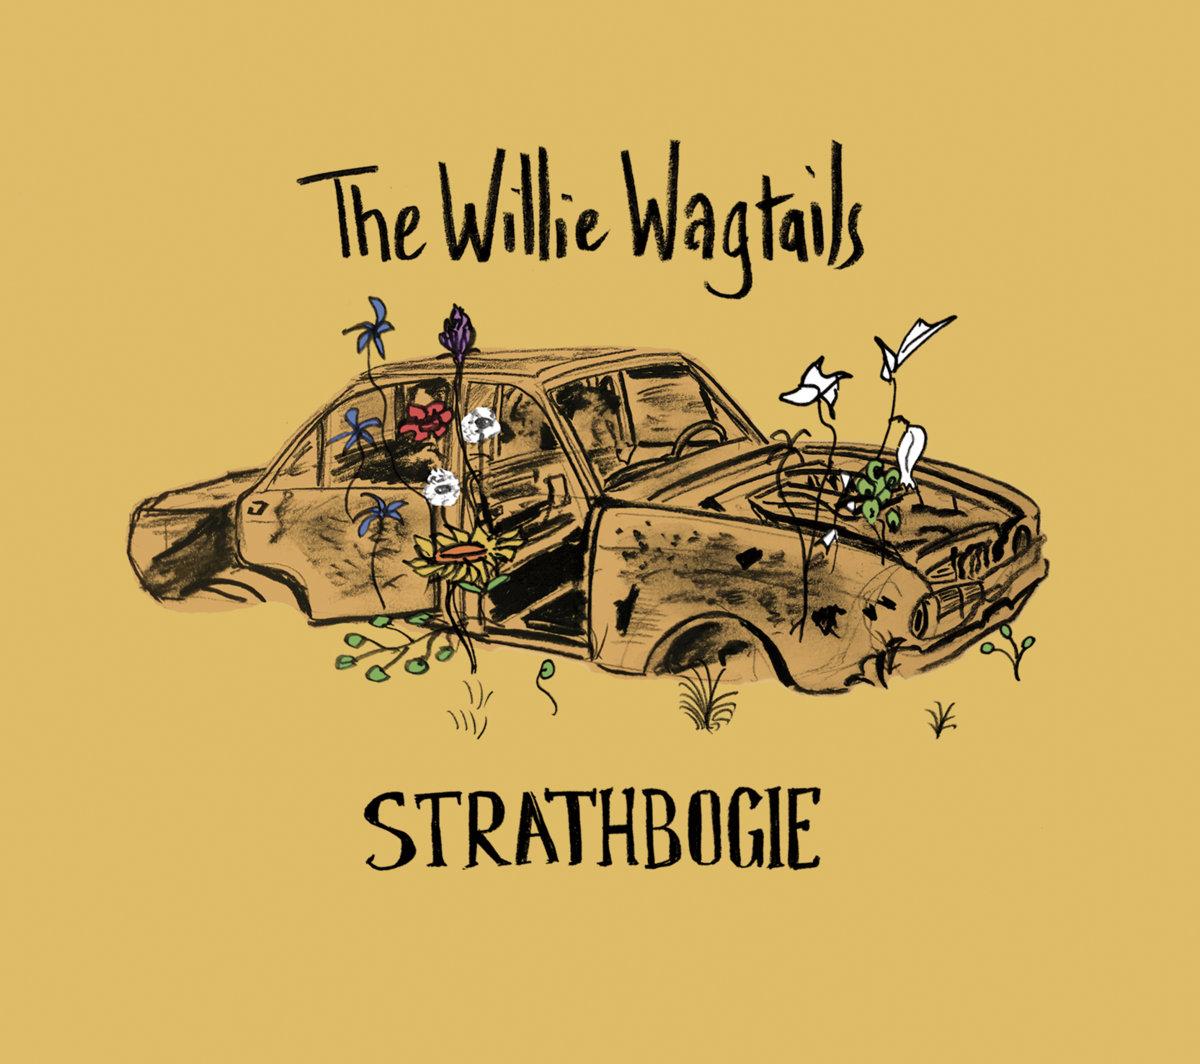 The Willie Wagtails - Strathbogie